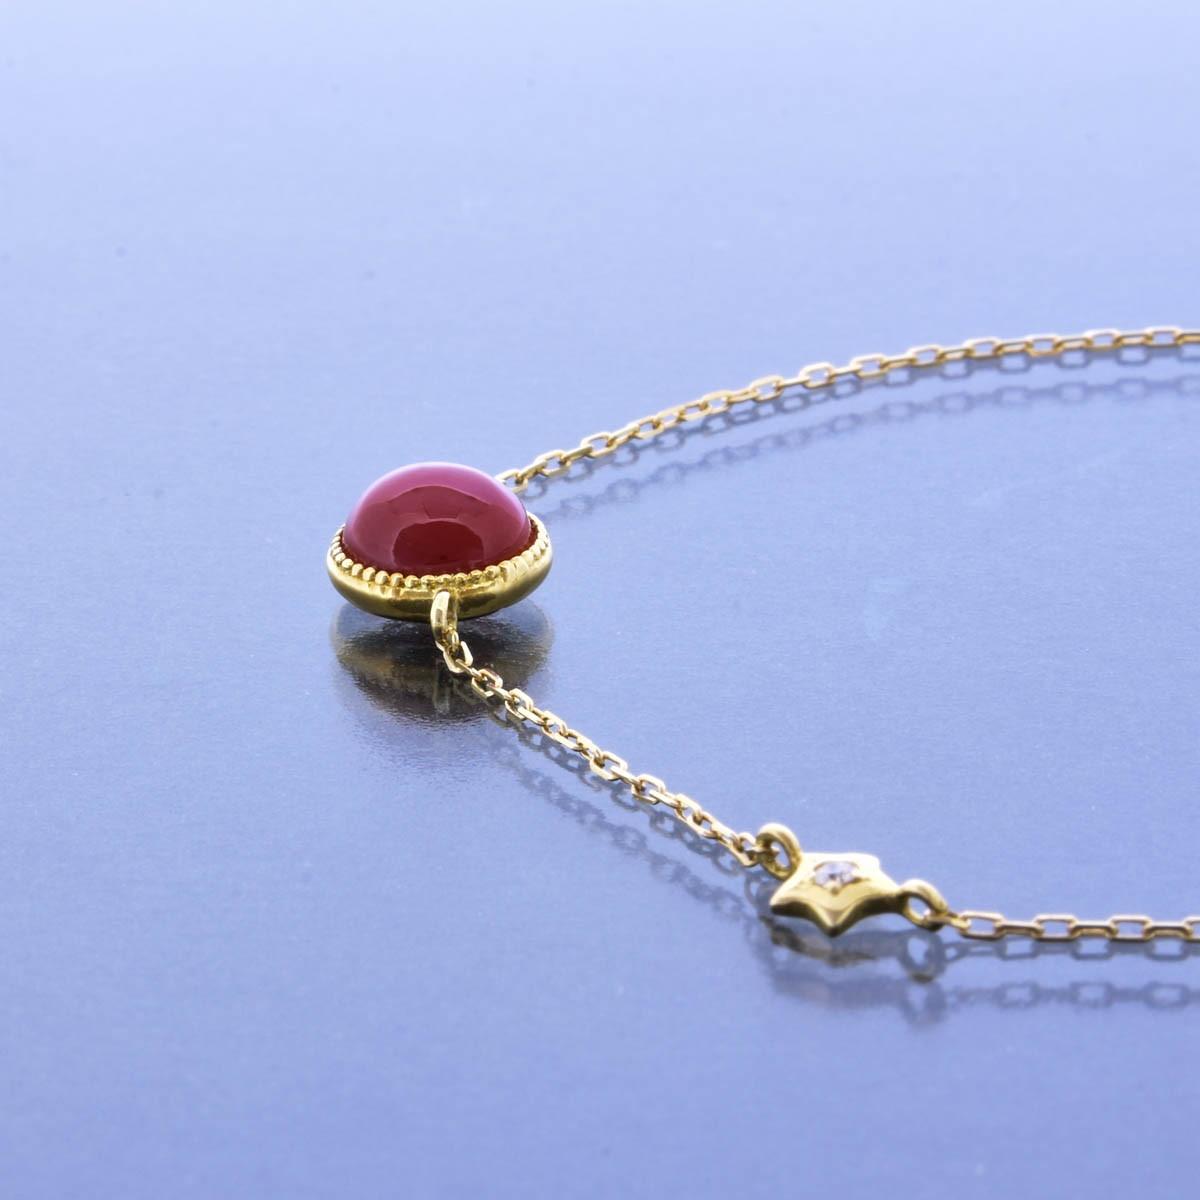 K18YG 赤珊瑚 ブレスレット 星座 モチーフ 天秤座 てんびん座